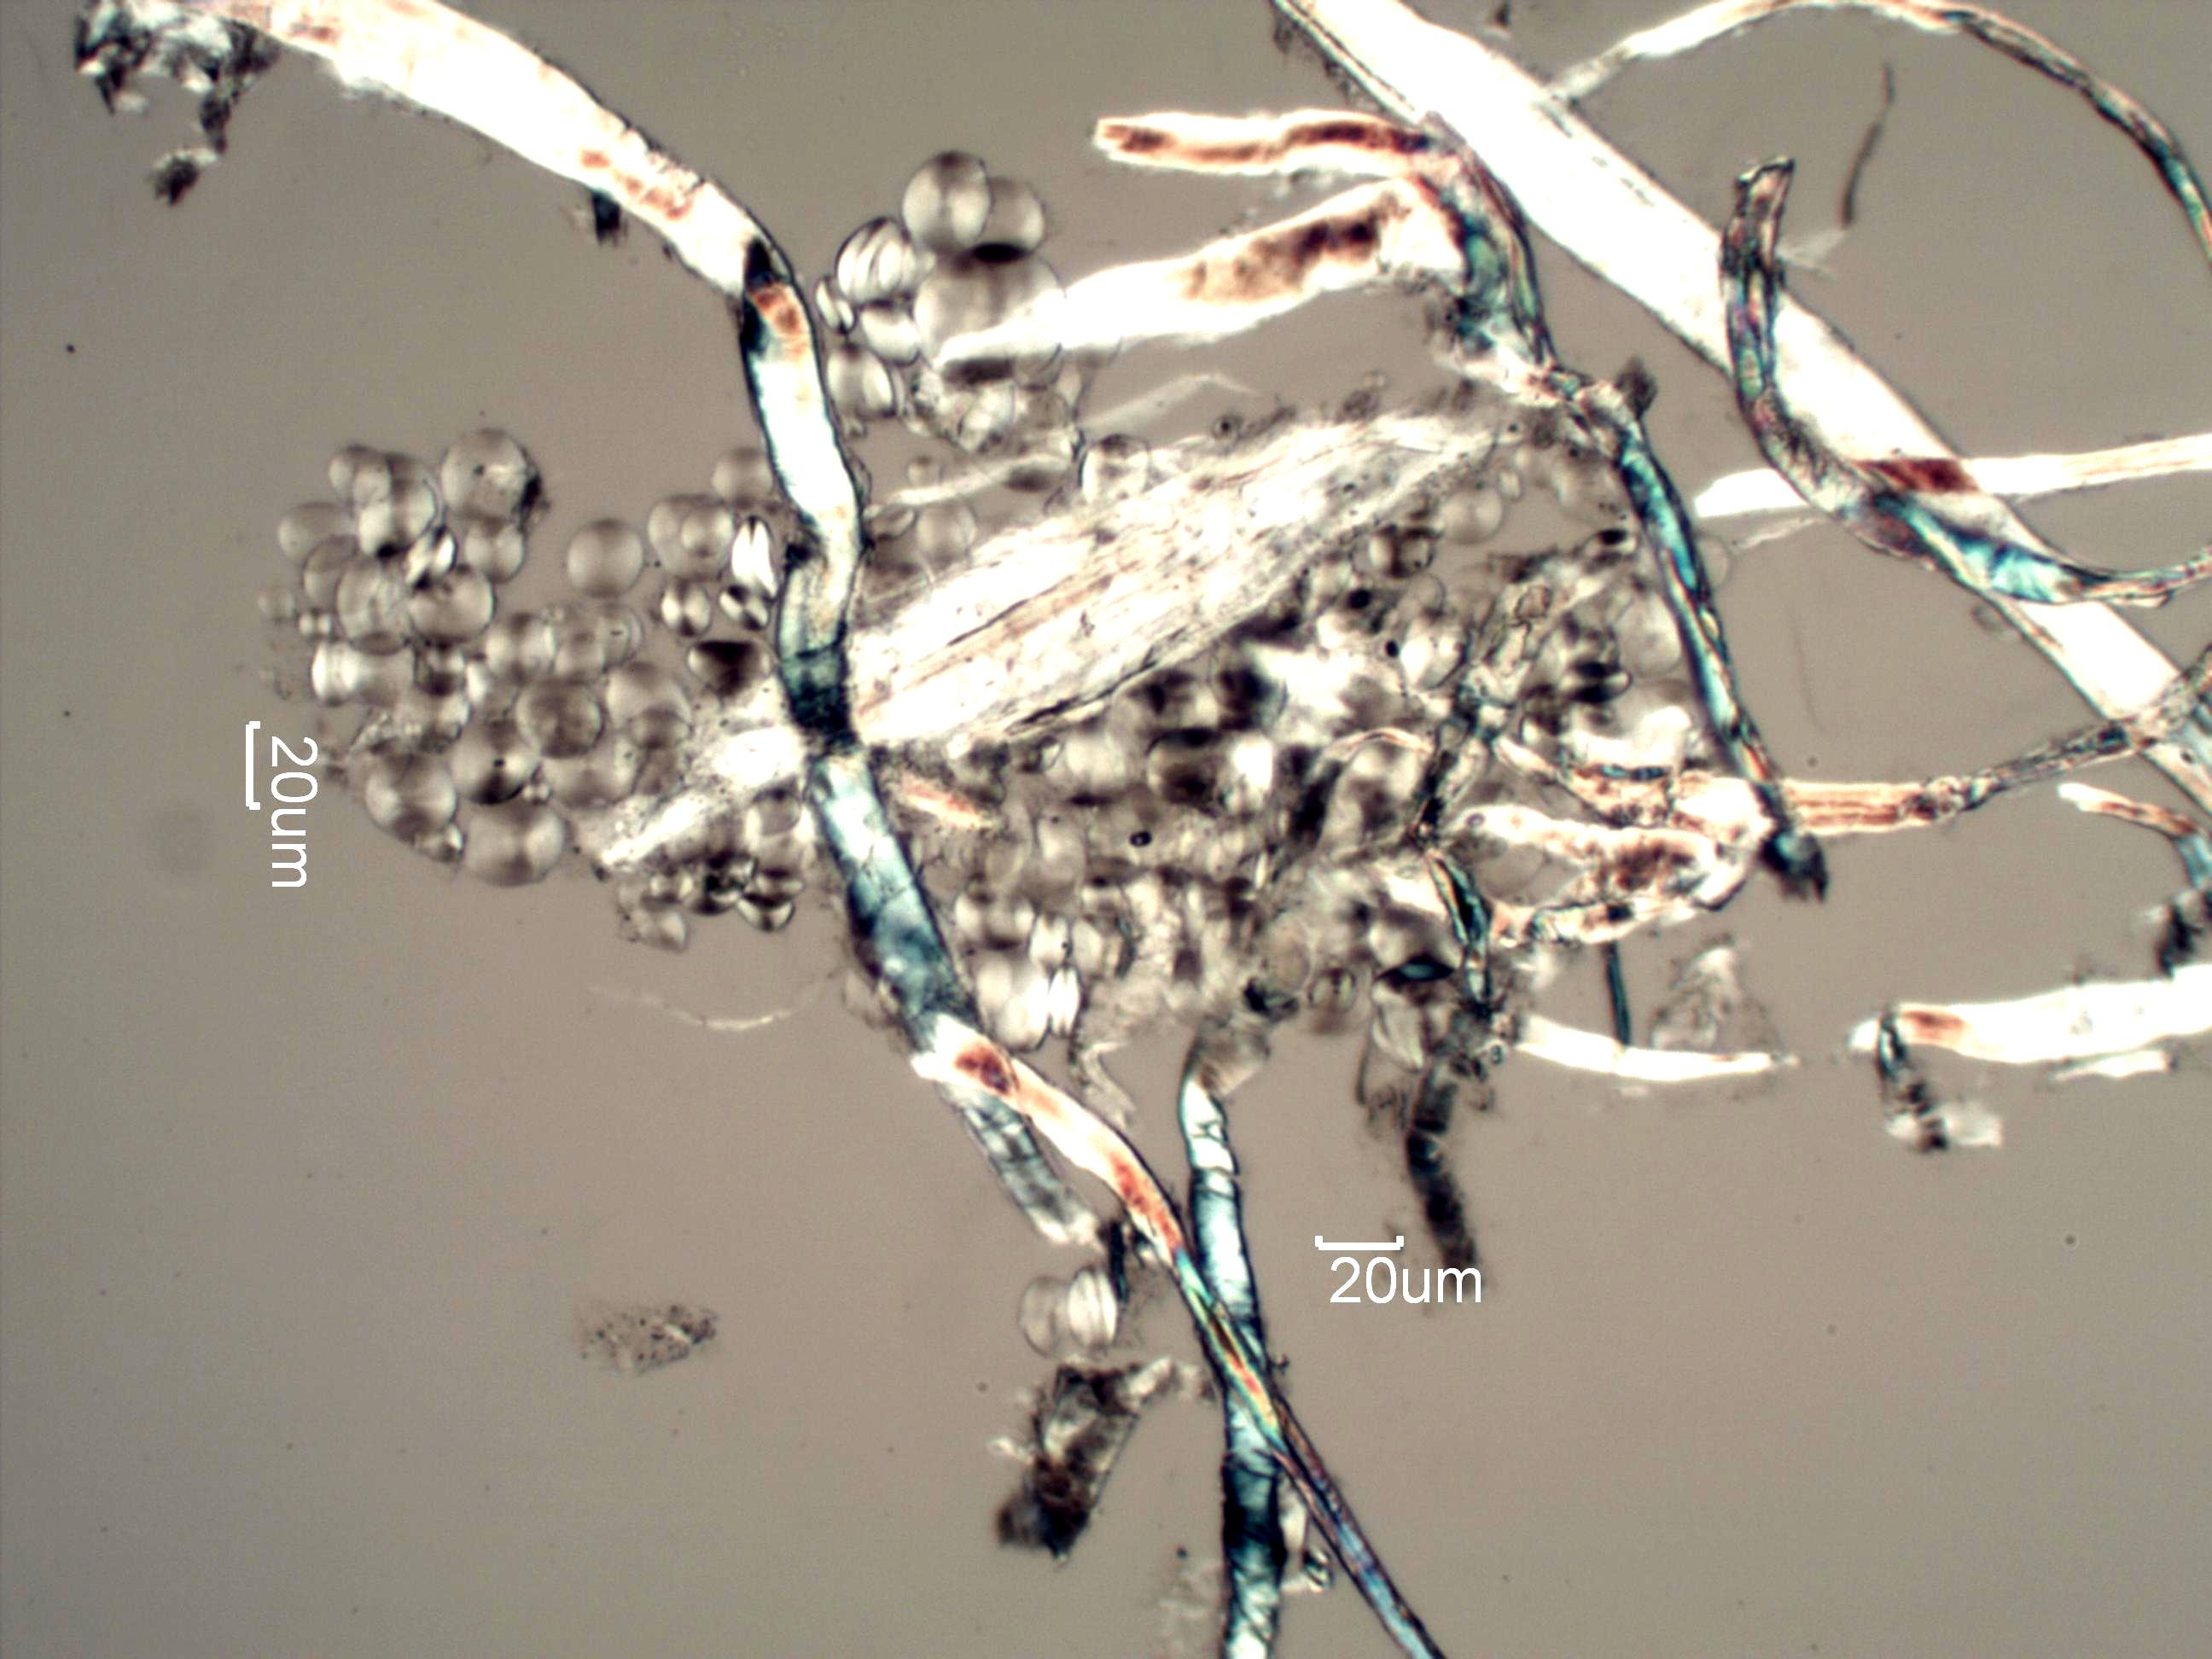 carbonless copy paper debris under the microscope